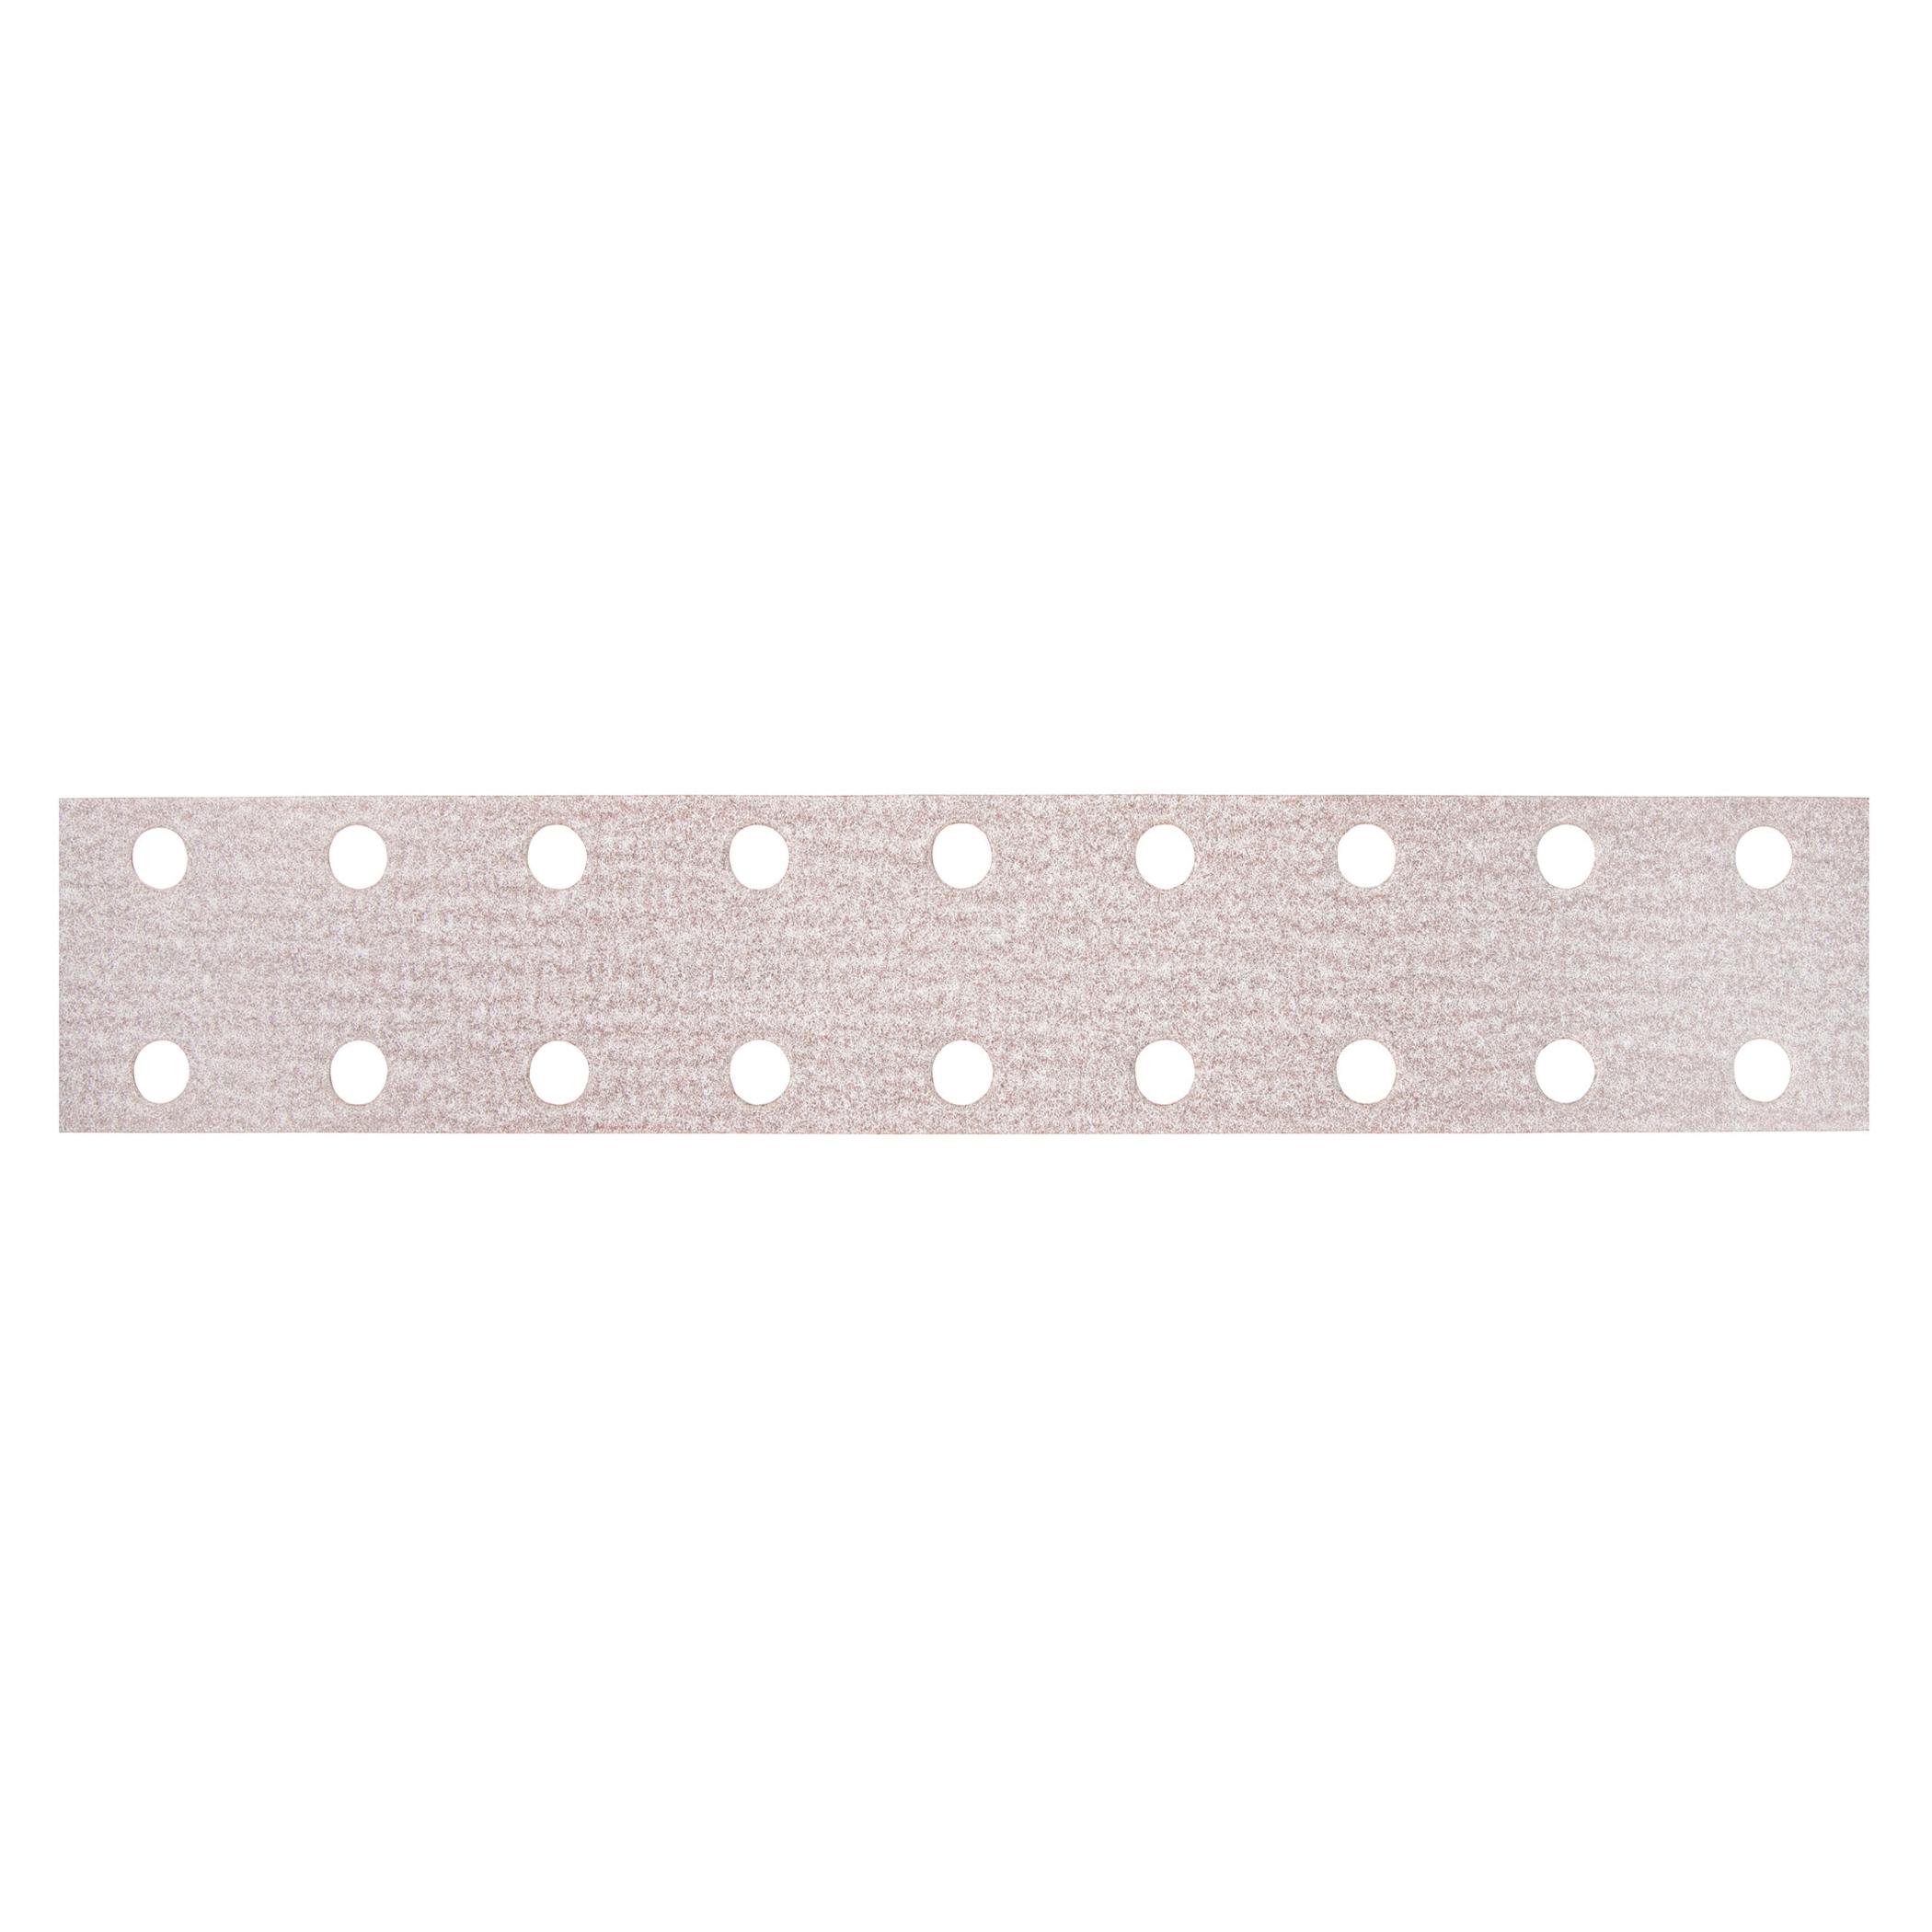 Norton® 66261131656 A275OP Vacuum Coated File Strip, 16 in L x 2-3/4 in W, P120 Grit, Medium Grade, Aluminum Oxide Abrasive, Anti-Loading Paper Backing